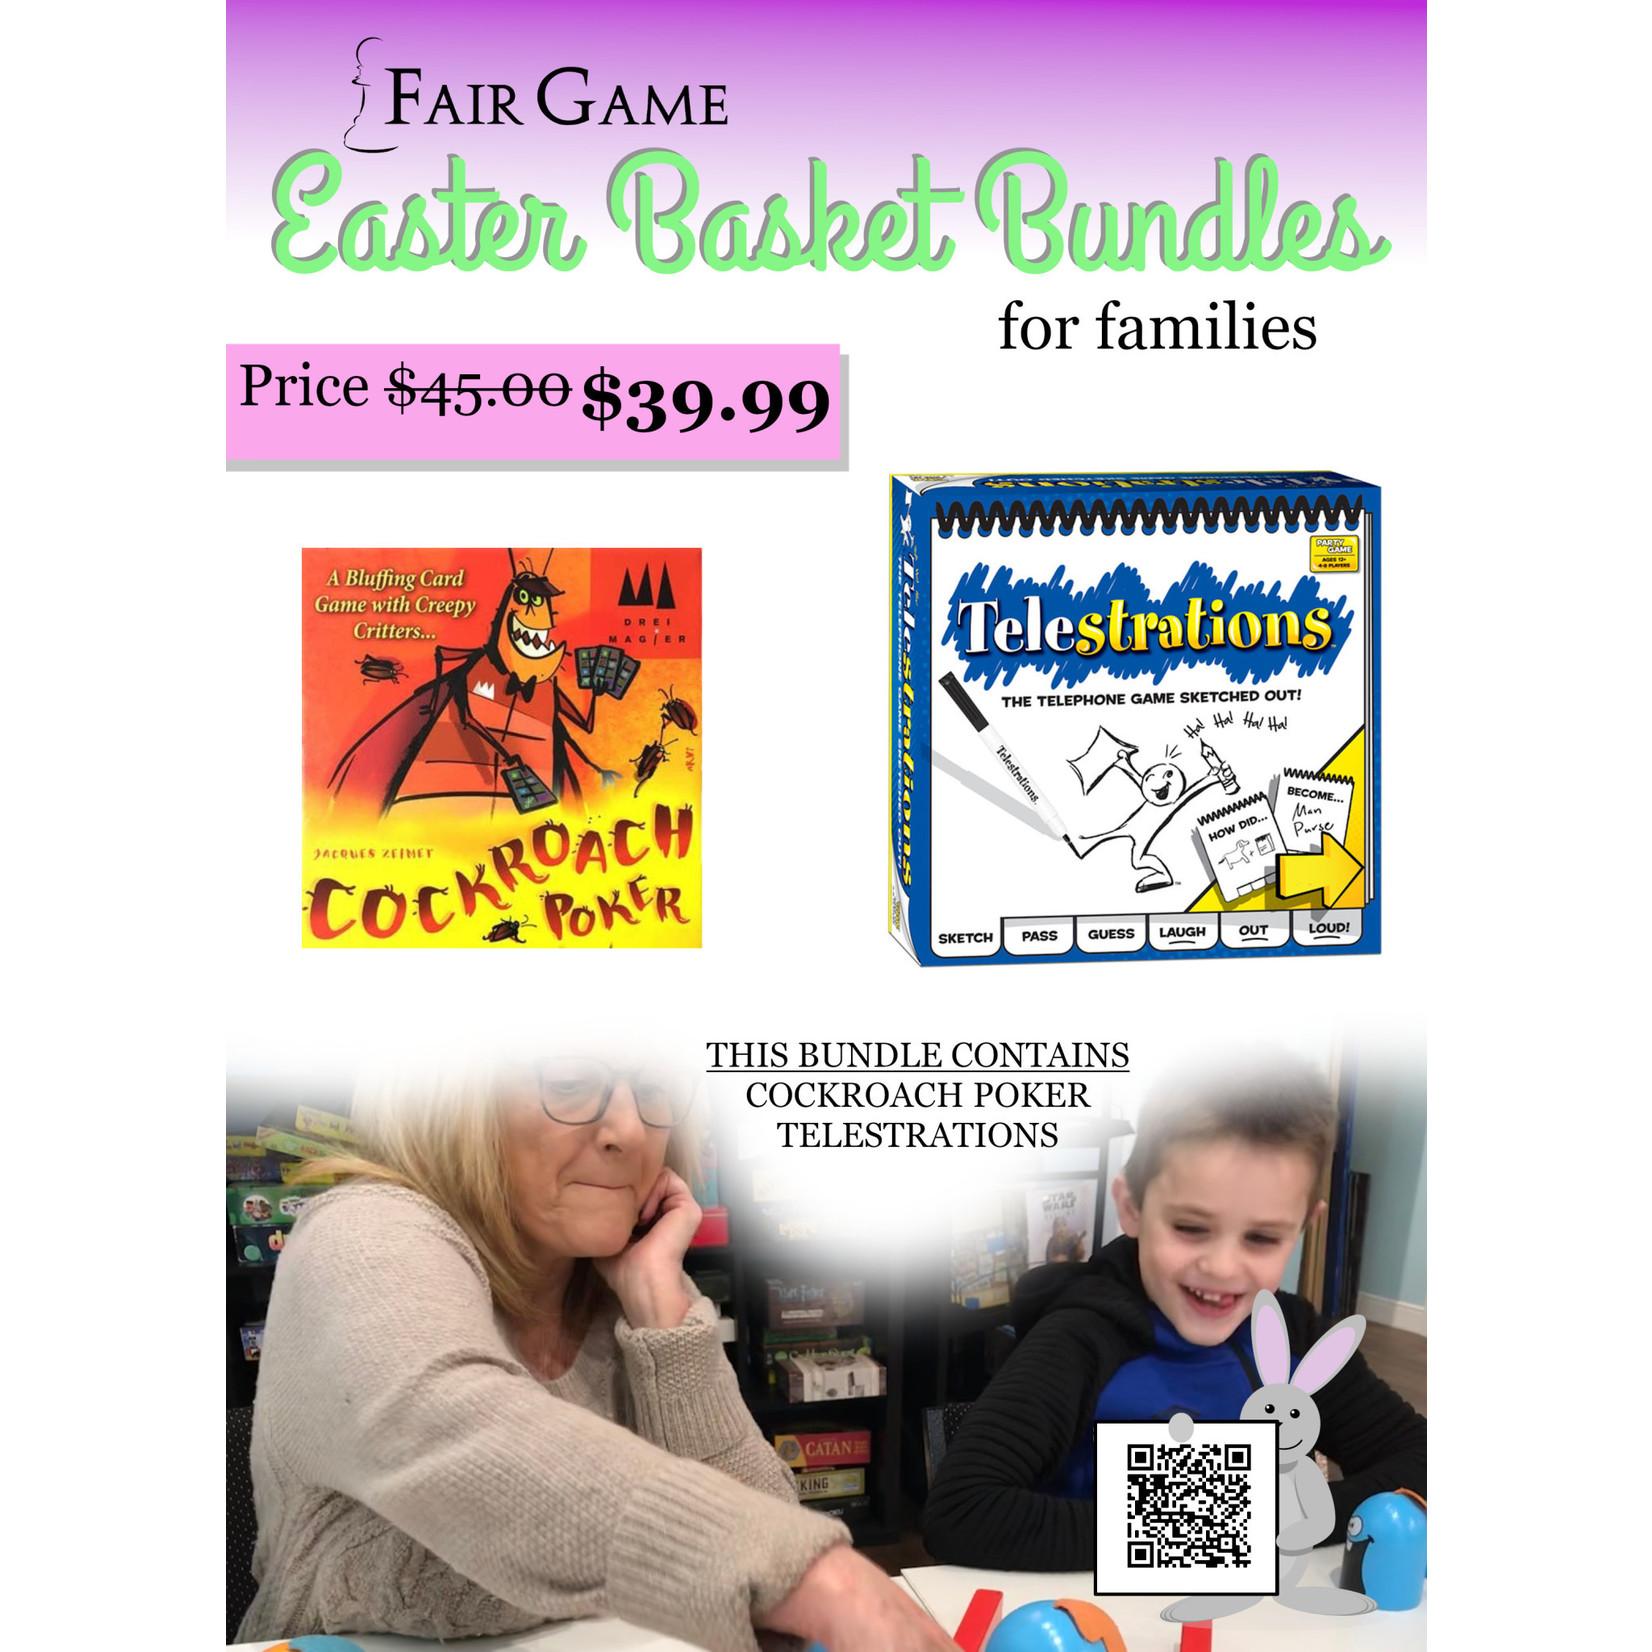 Fair Game Easter Basket Bundle for Families